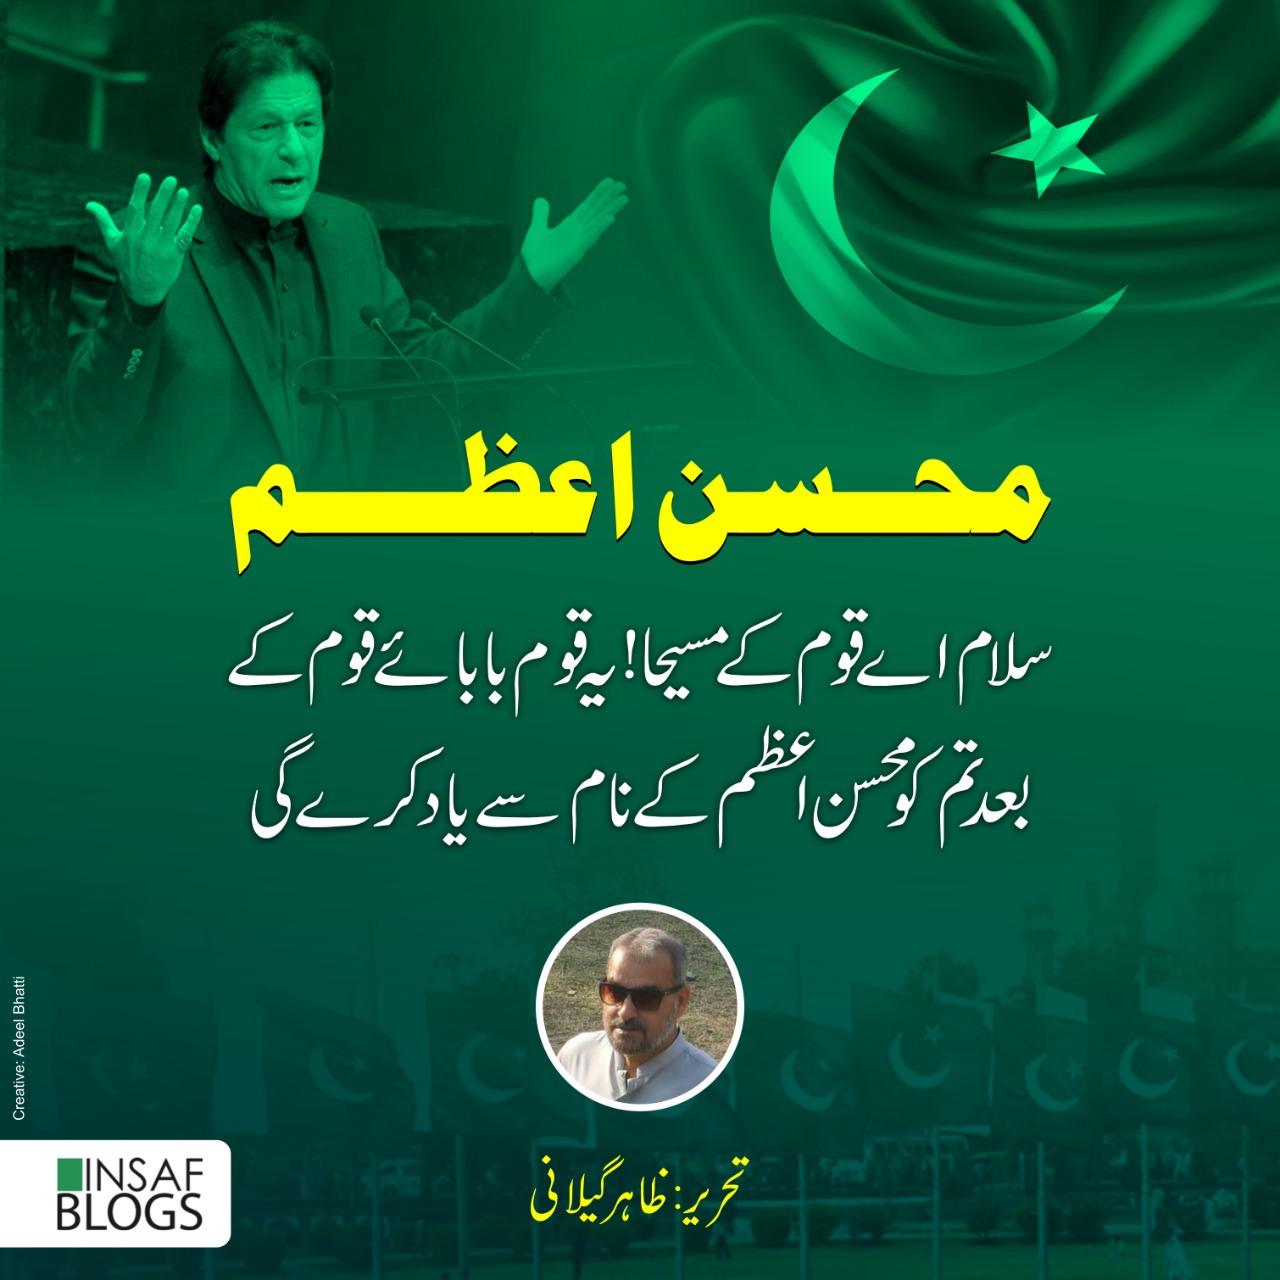 Salam Mohsin E Azam - Insaf Blog